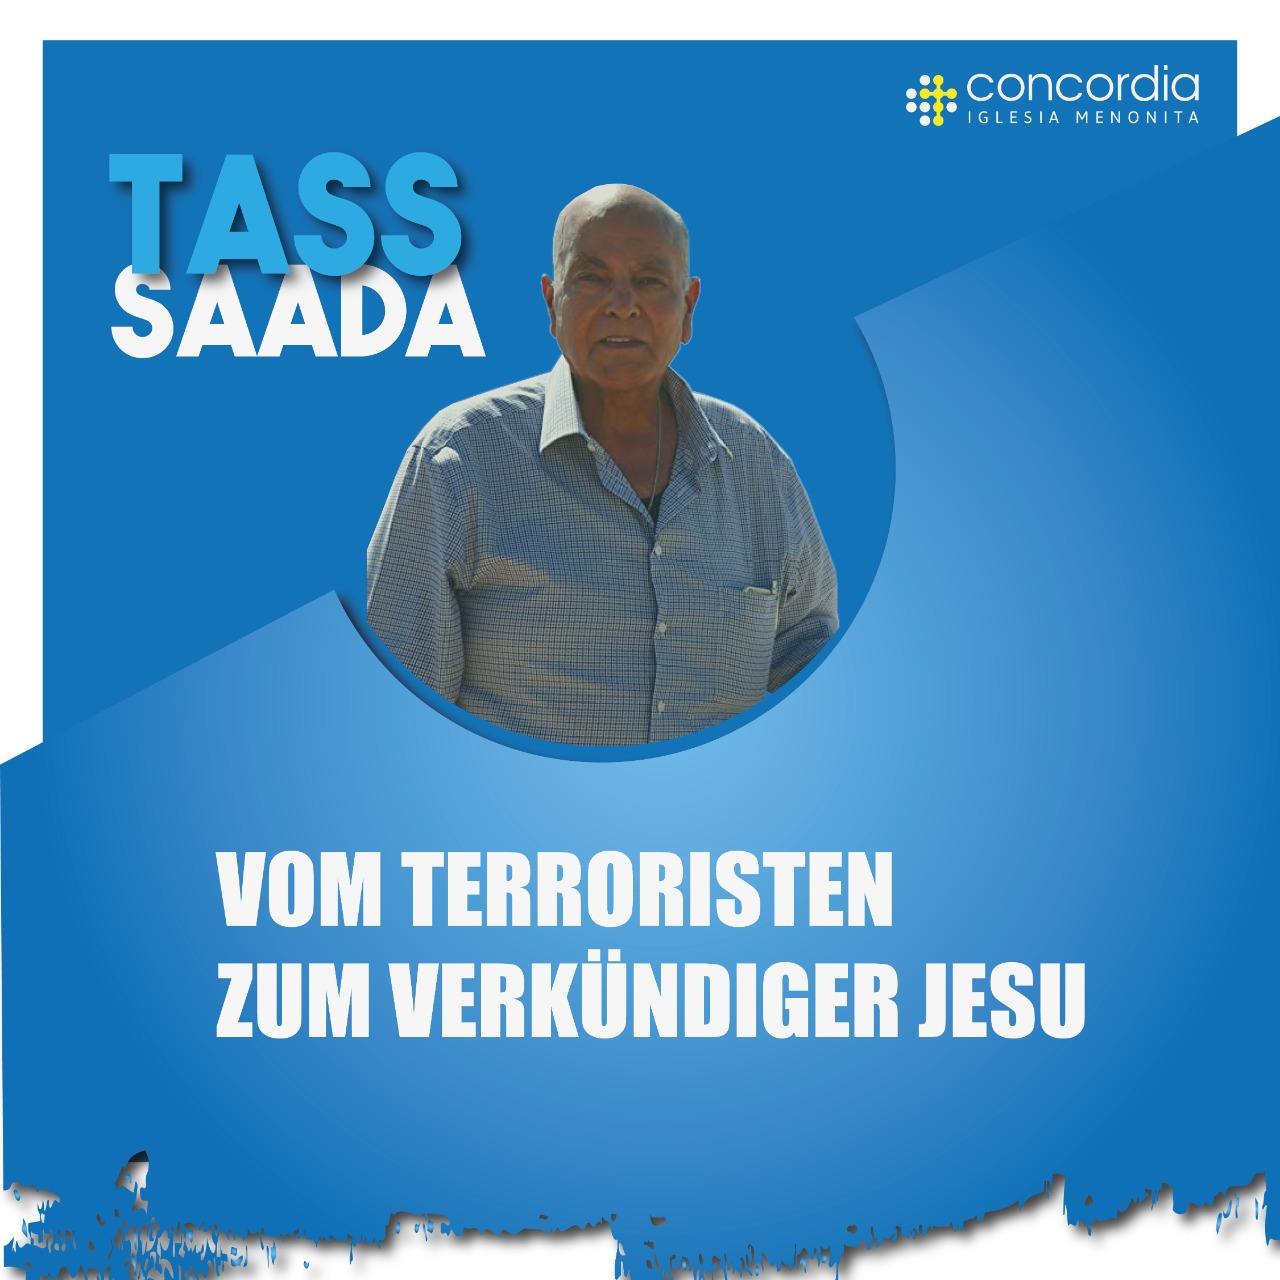 Vom Terroristen zum Verkündiger Jesu - Redner: Tass Saada